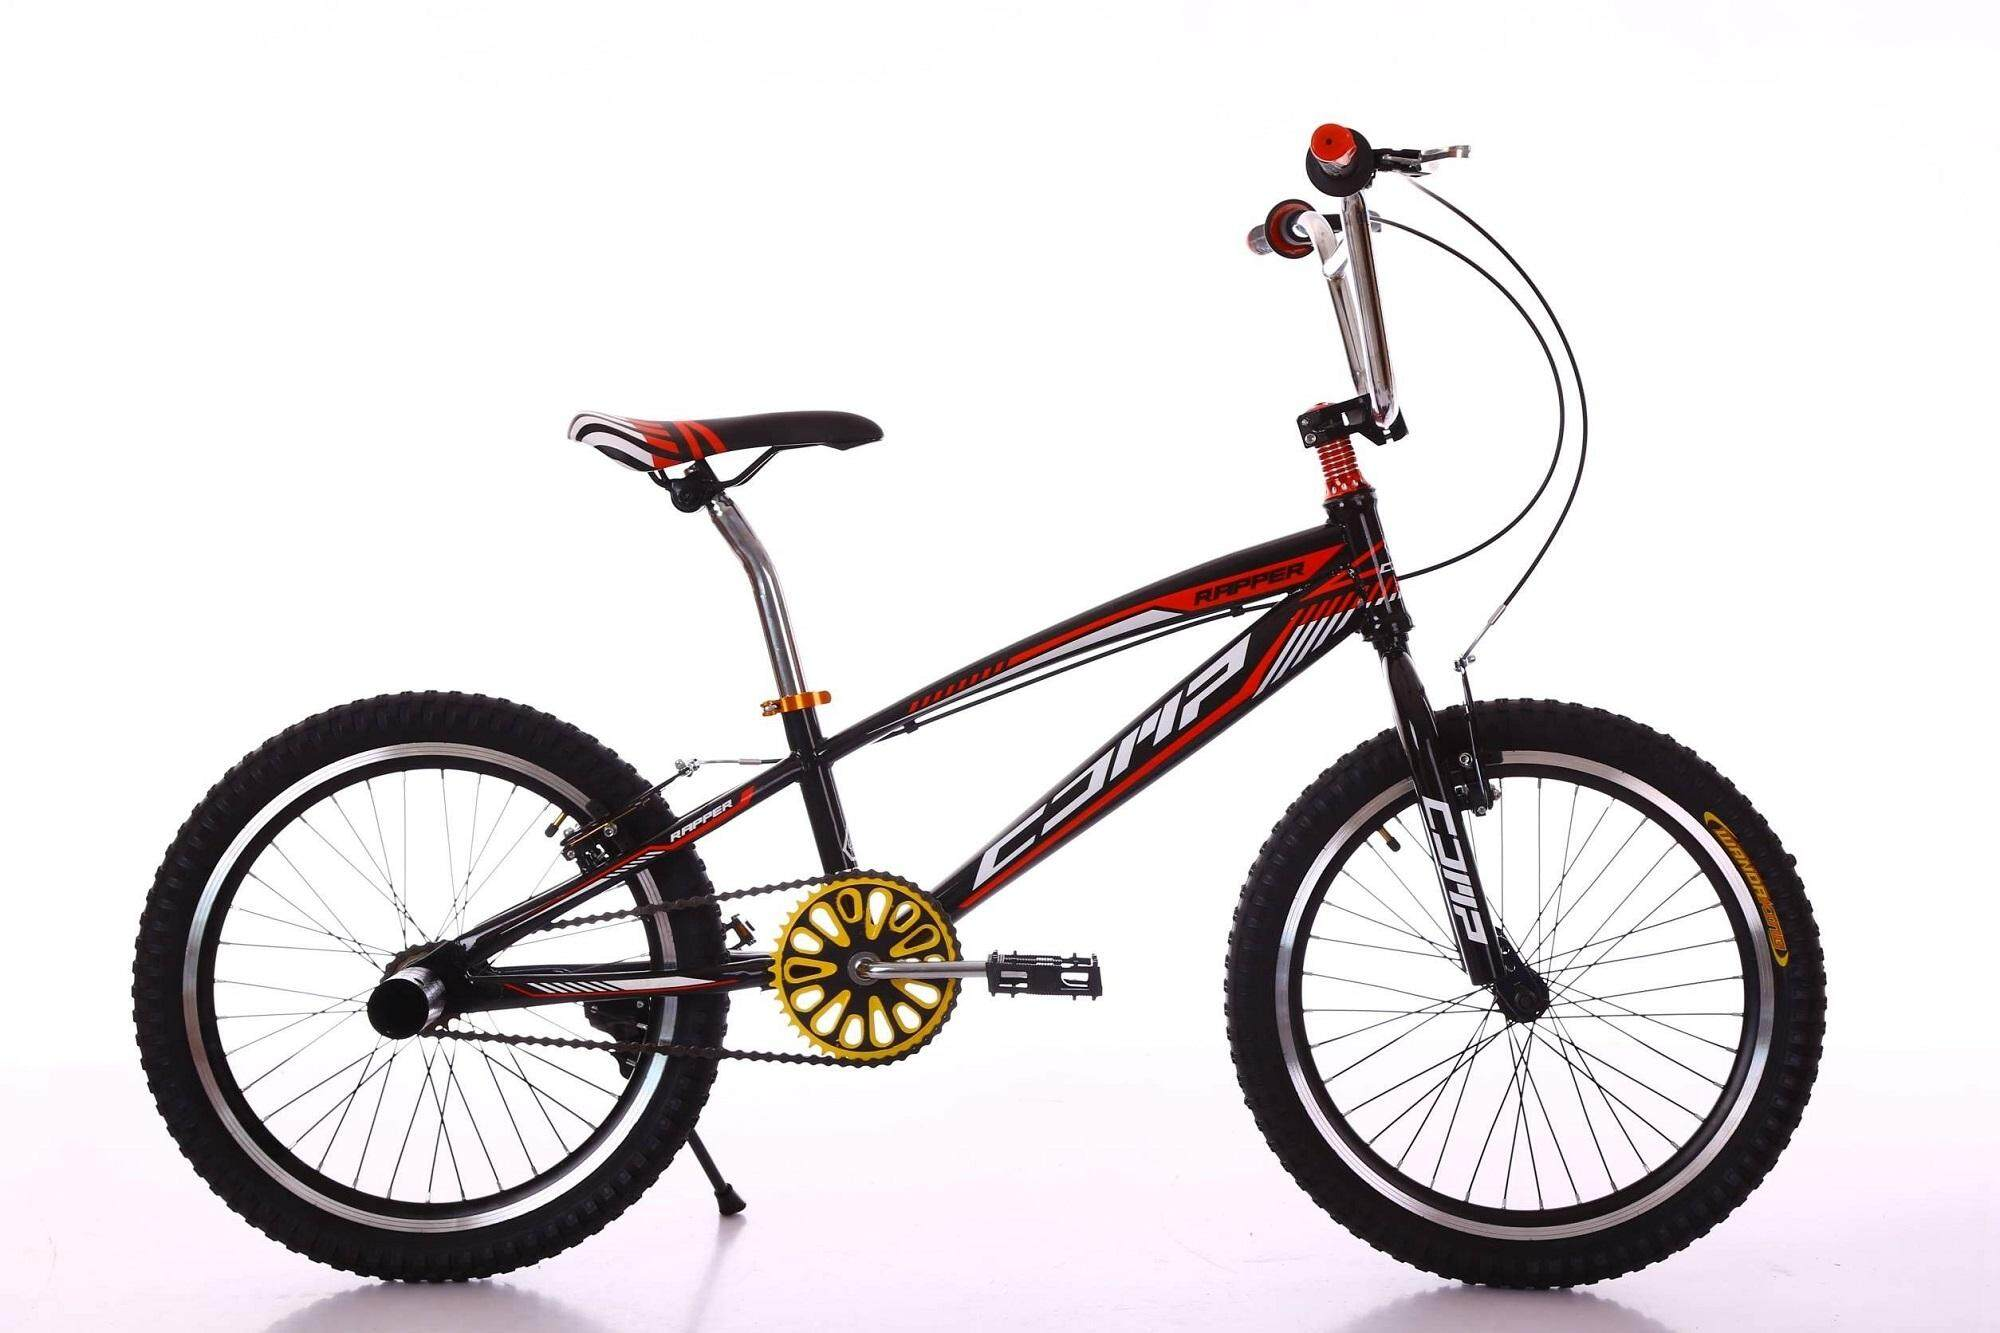 Comp จักรยาน 20 นิ้ว Bmx รุ่น Rapper By Tvy Bicycle.